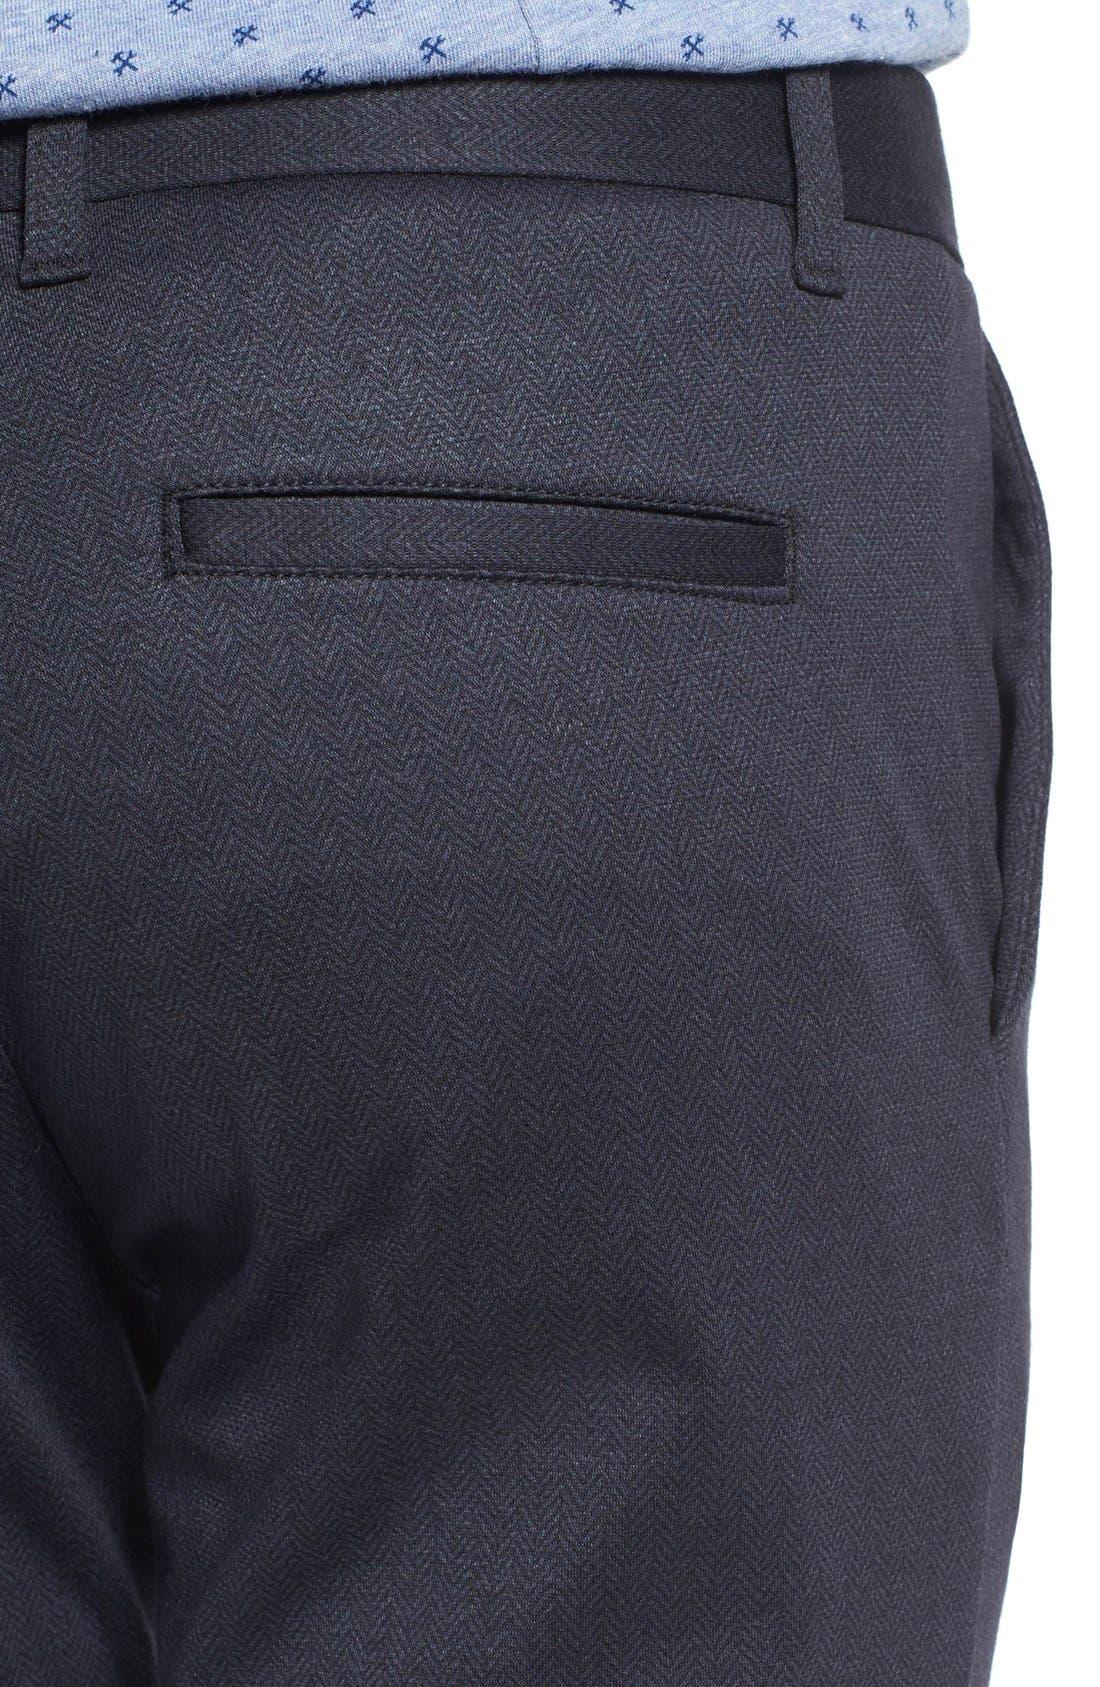 Prospect Herringbone Slim Fit Trousers,                             Alternate thumbnail 5, color,                             001